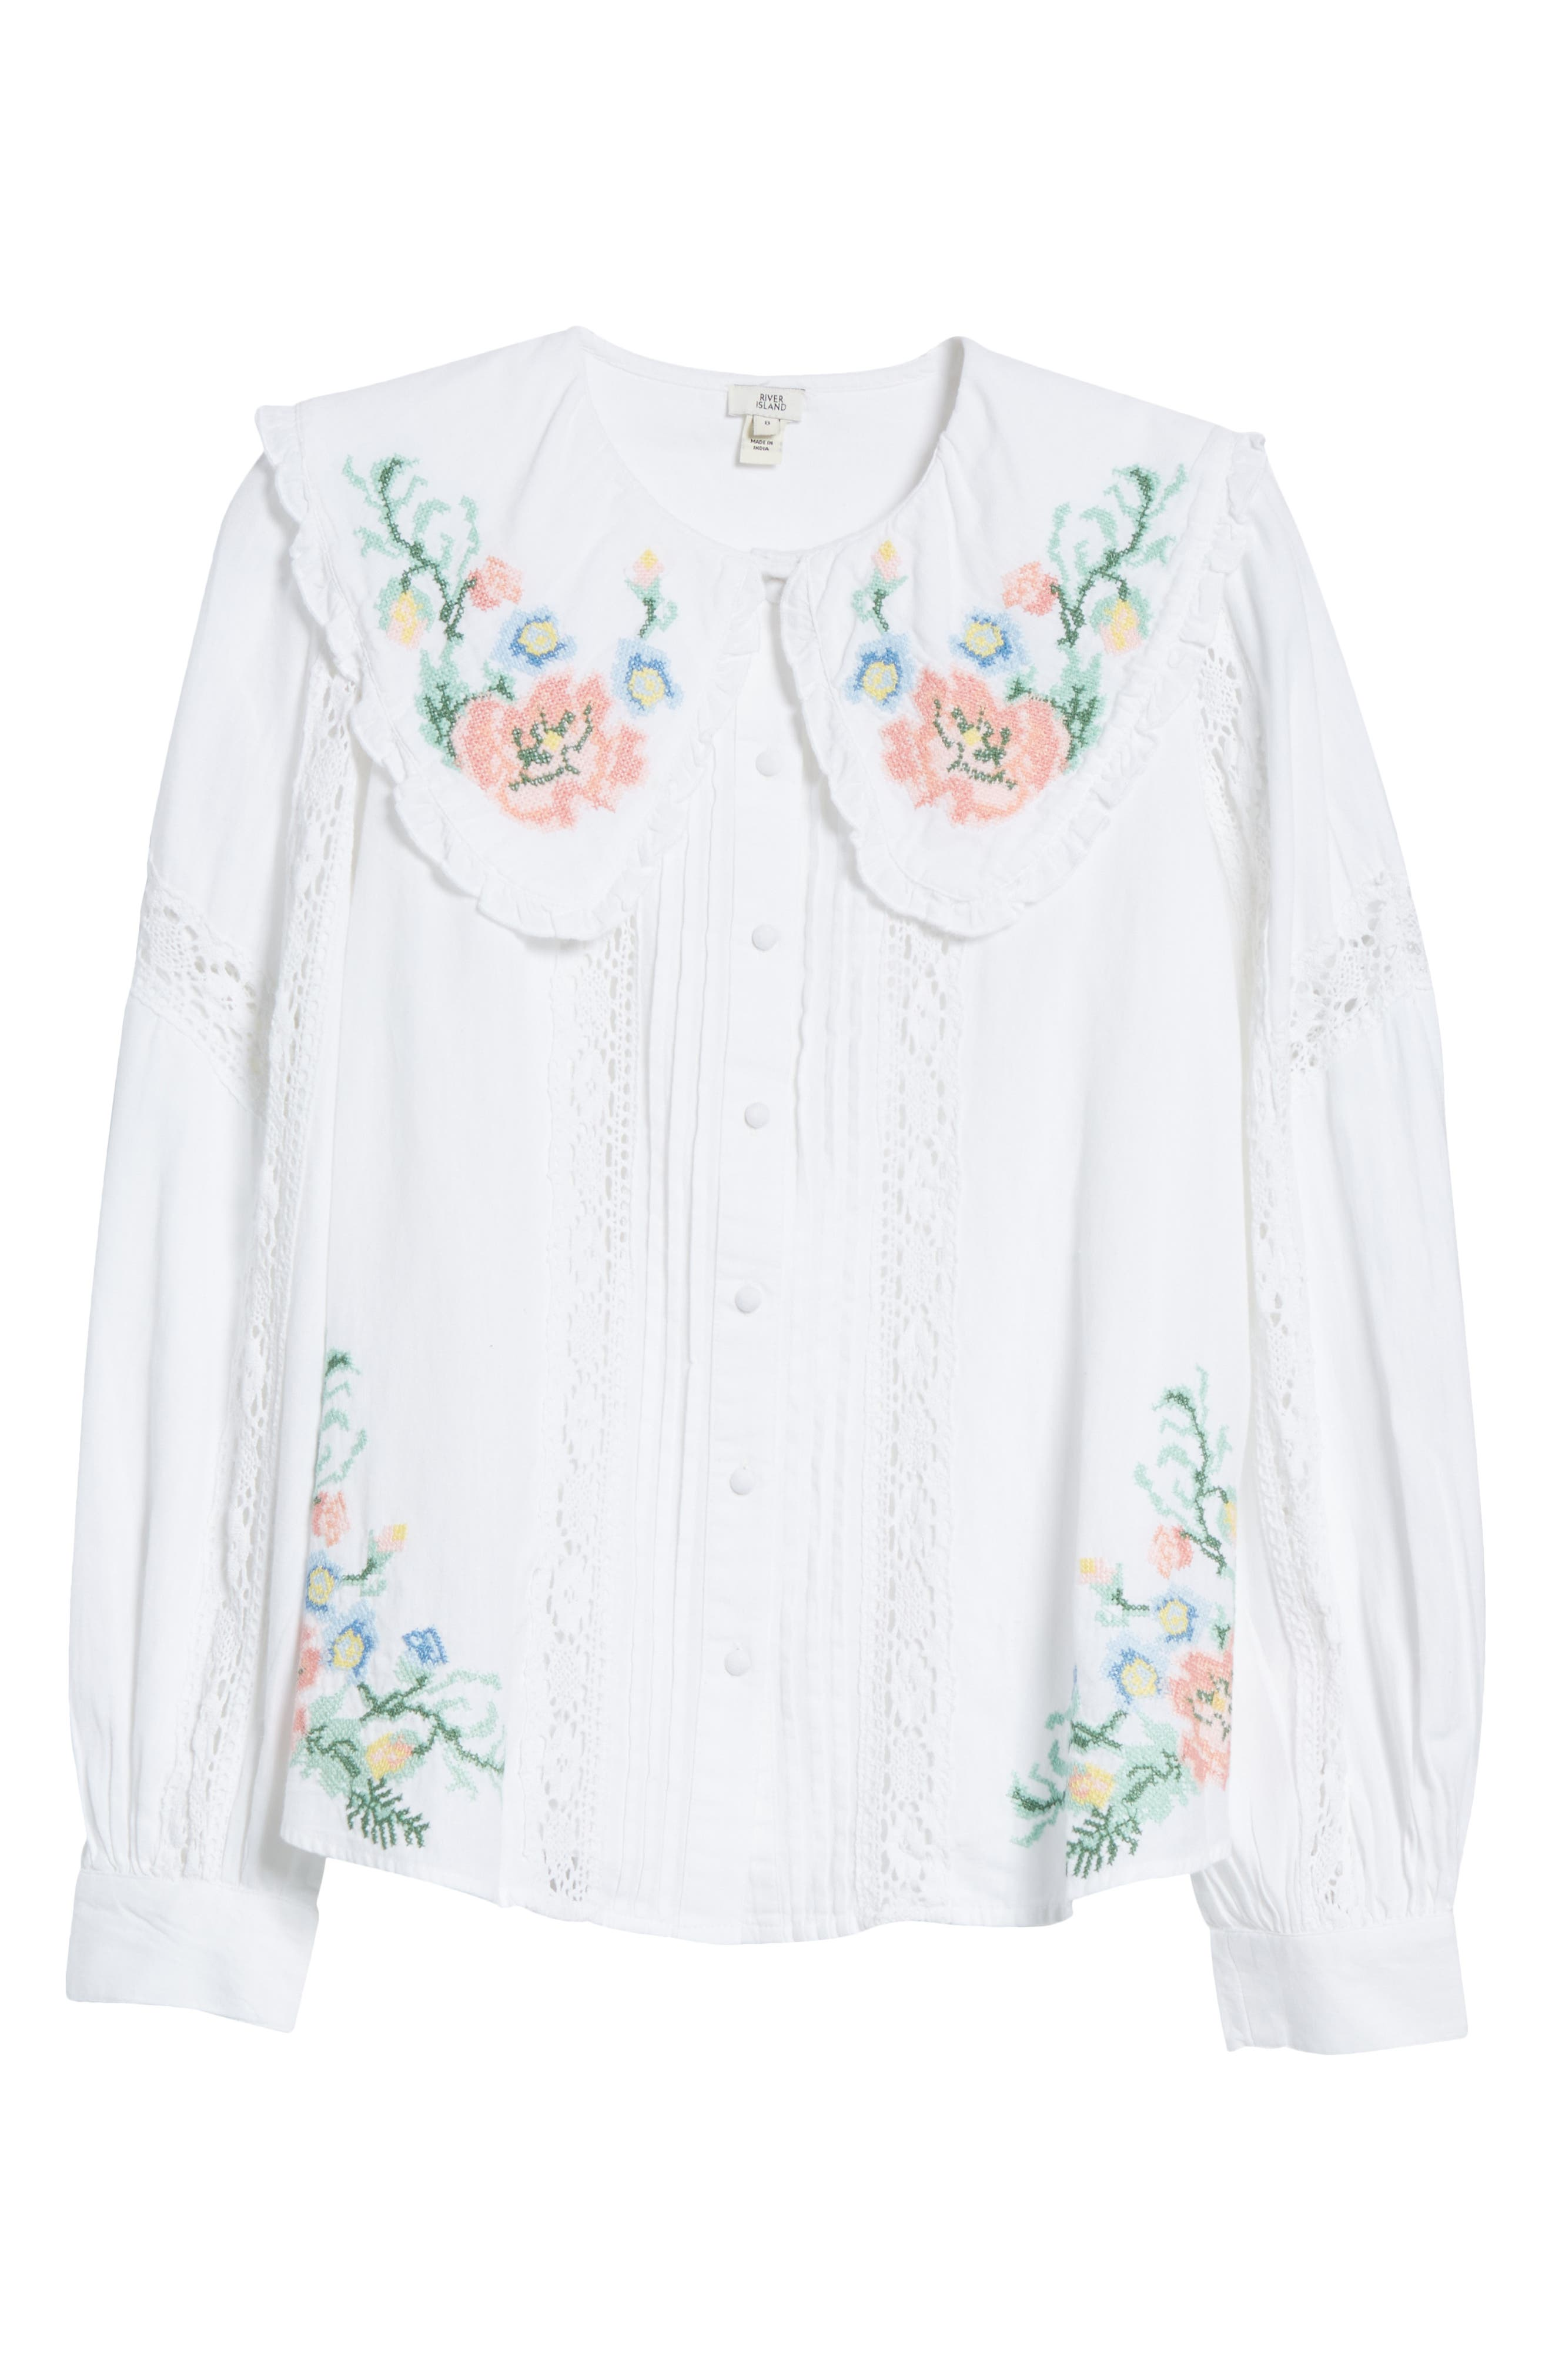 Cottagecore Clothing, Soft Aesthetic Womens River Island Embroidered Pilgrim Collar Blouse Size 12 US - White $75.00 AT vintagedancer.com